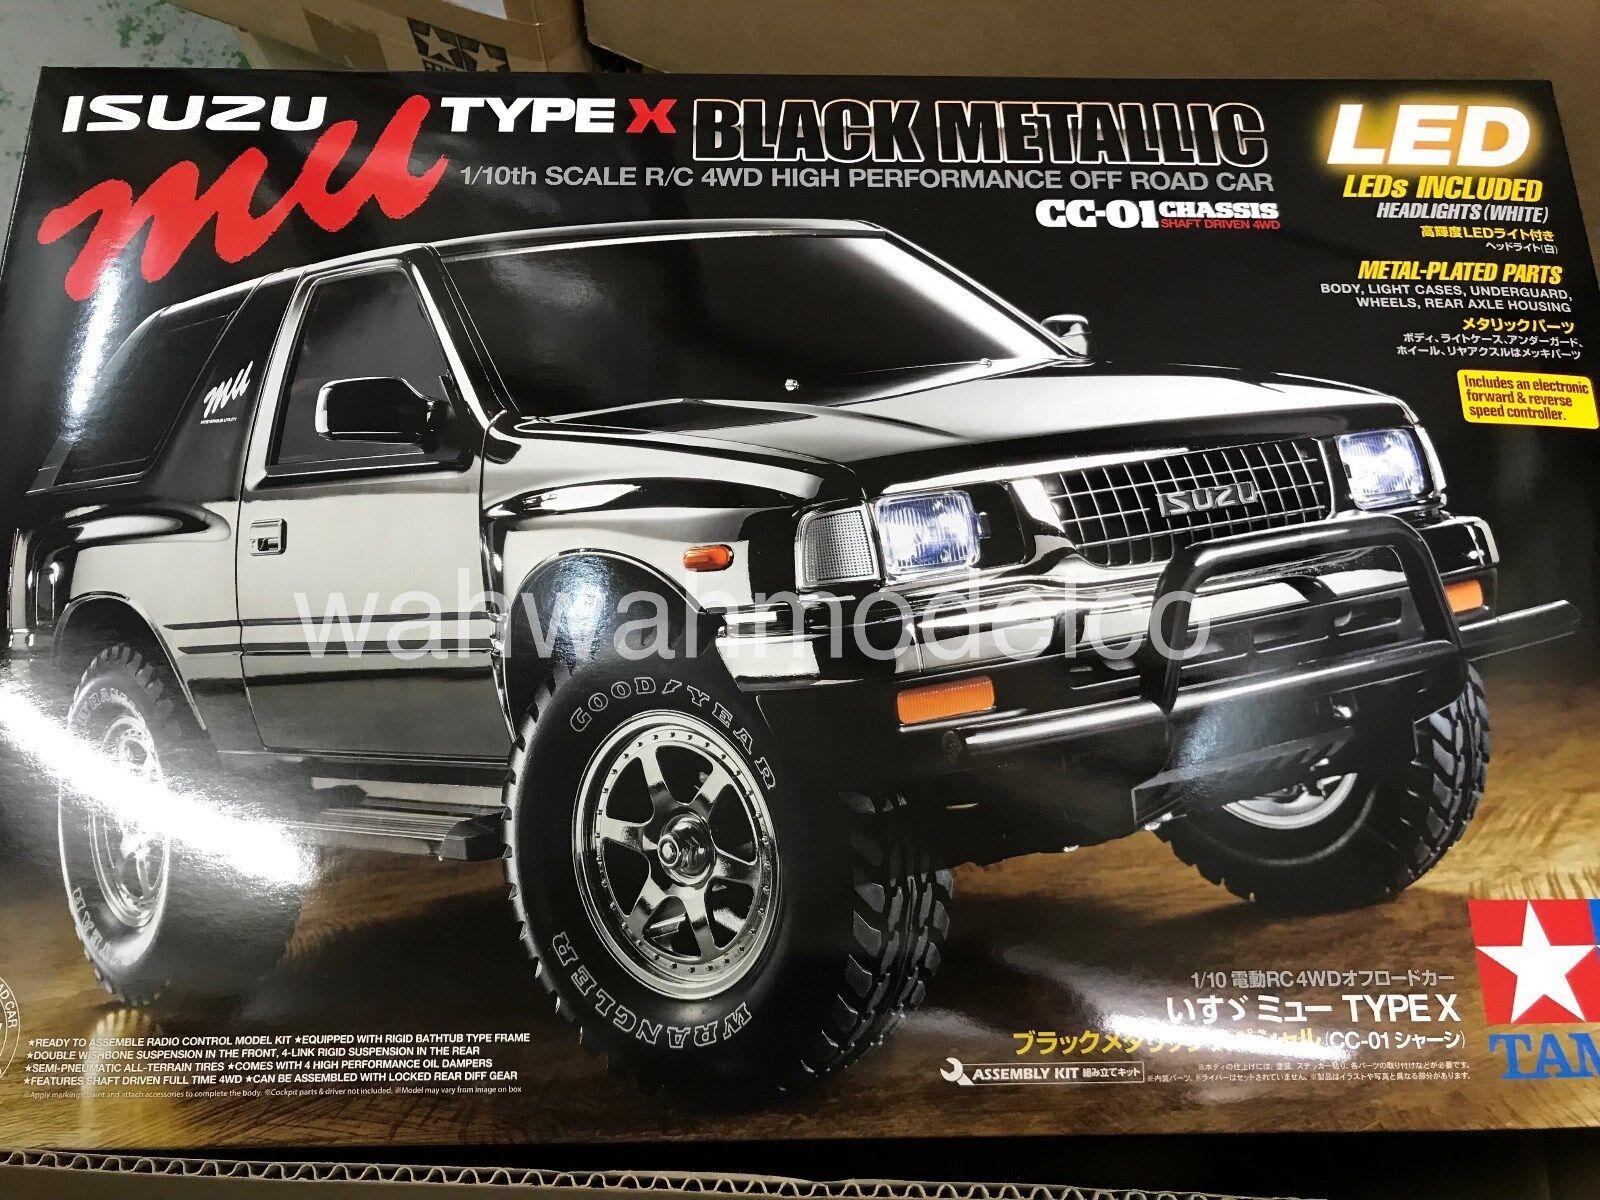 Tamiya  47383 1 10 Rc On-strada Isuzu Mu Type X Bm (Cc-01)  prezzo all'ingrosso e qualità affidabile